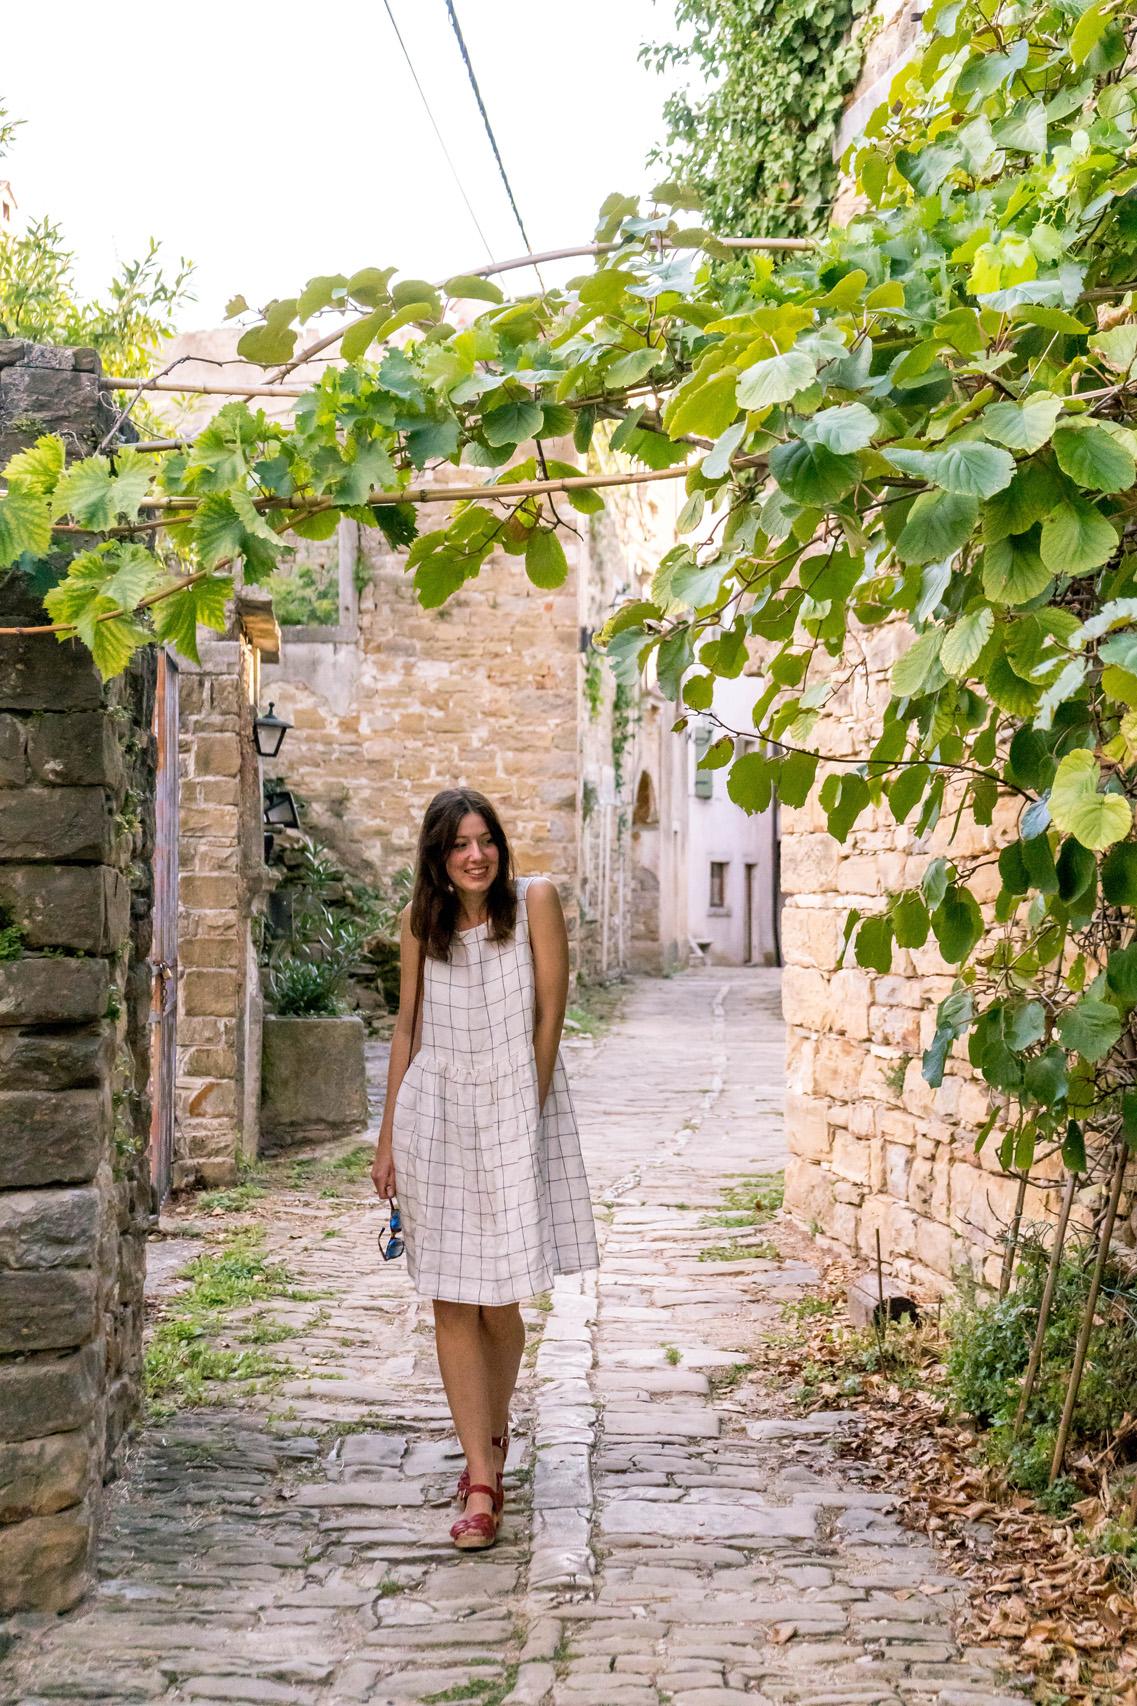 On the street in Oprtalj, Istria